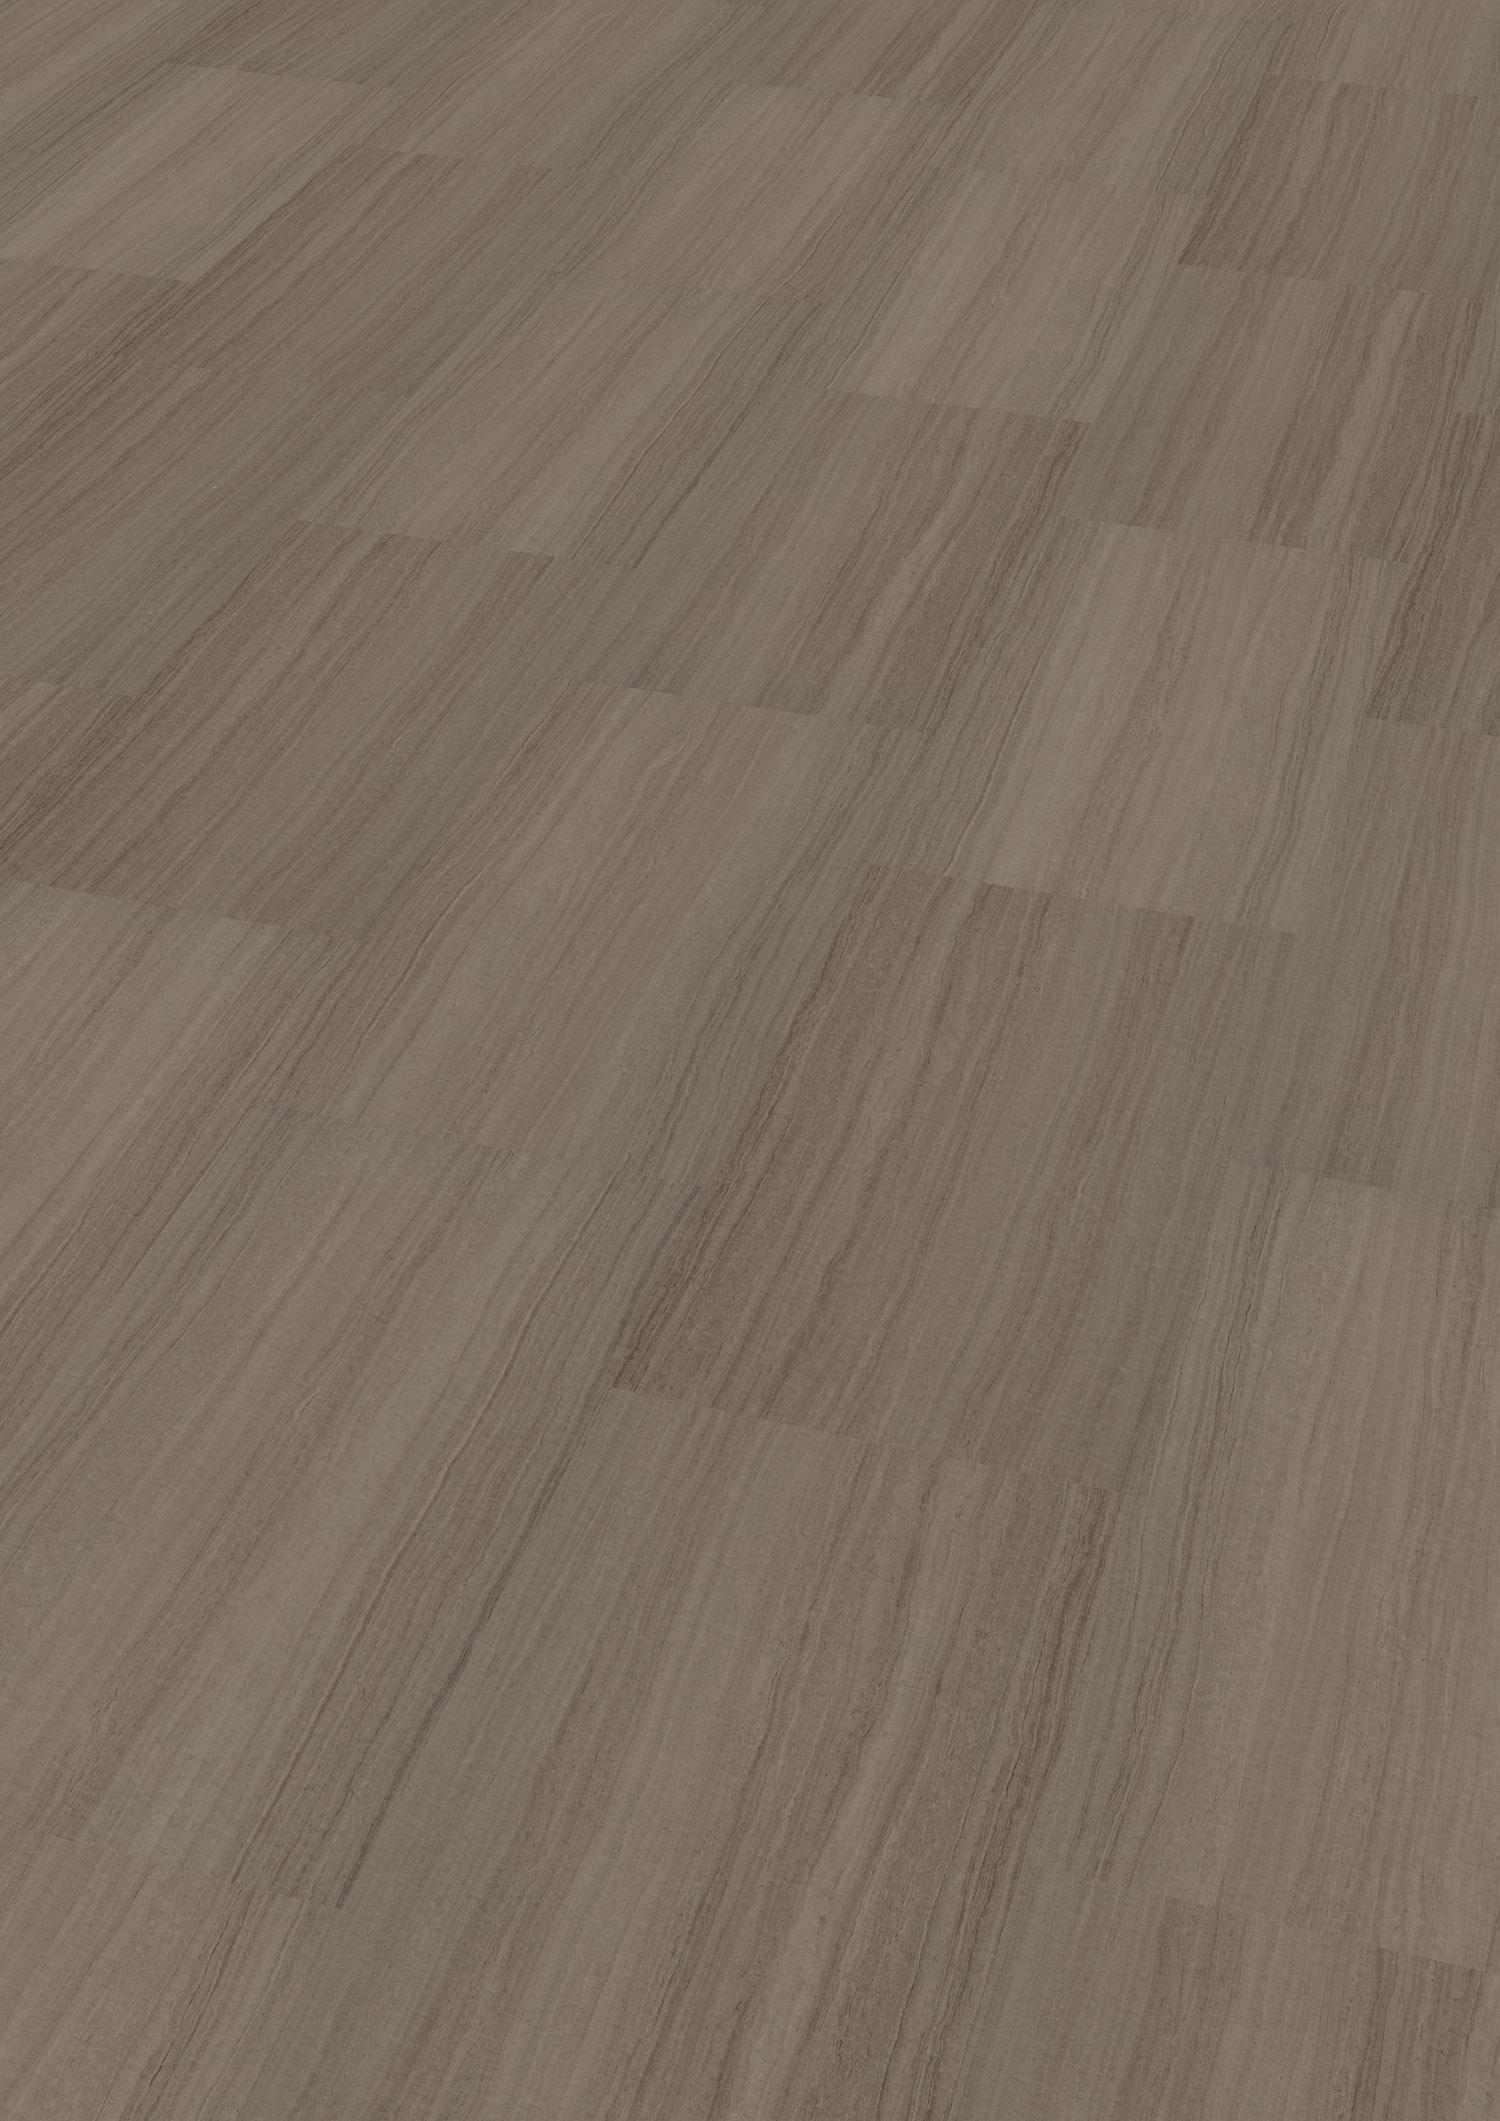 wineo vinyl 2 mm zum kleben lava grey wineo 600 stone. Black Bedroom Furniture Sets. Home Design Ideas